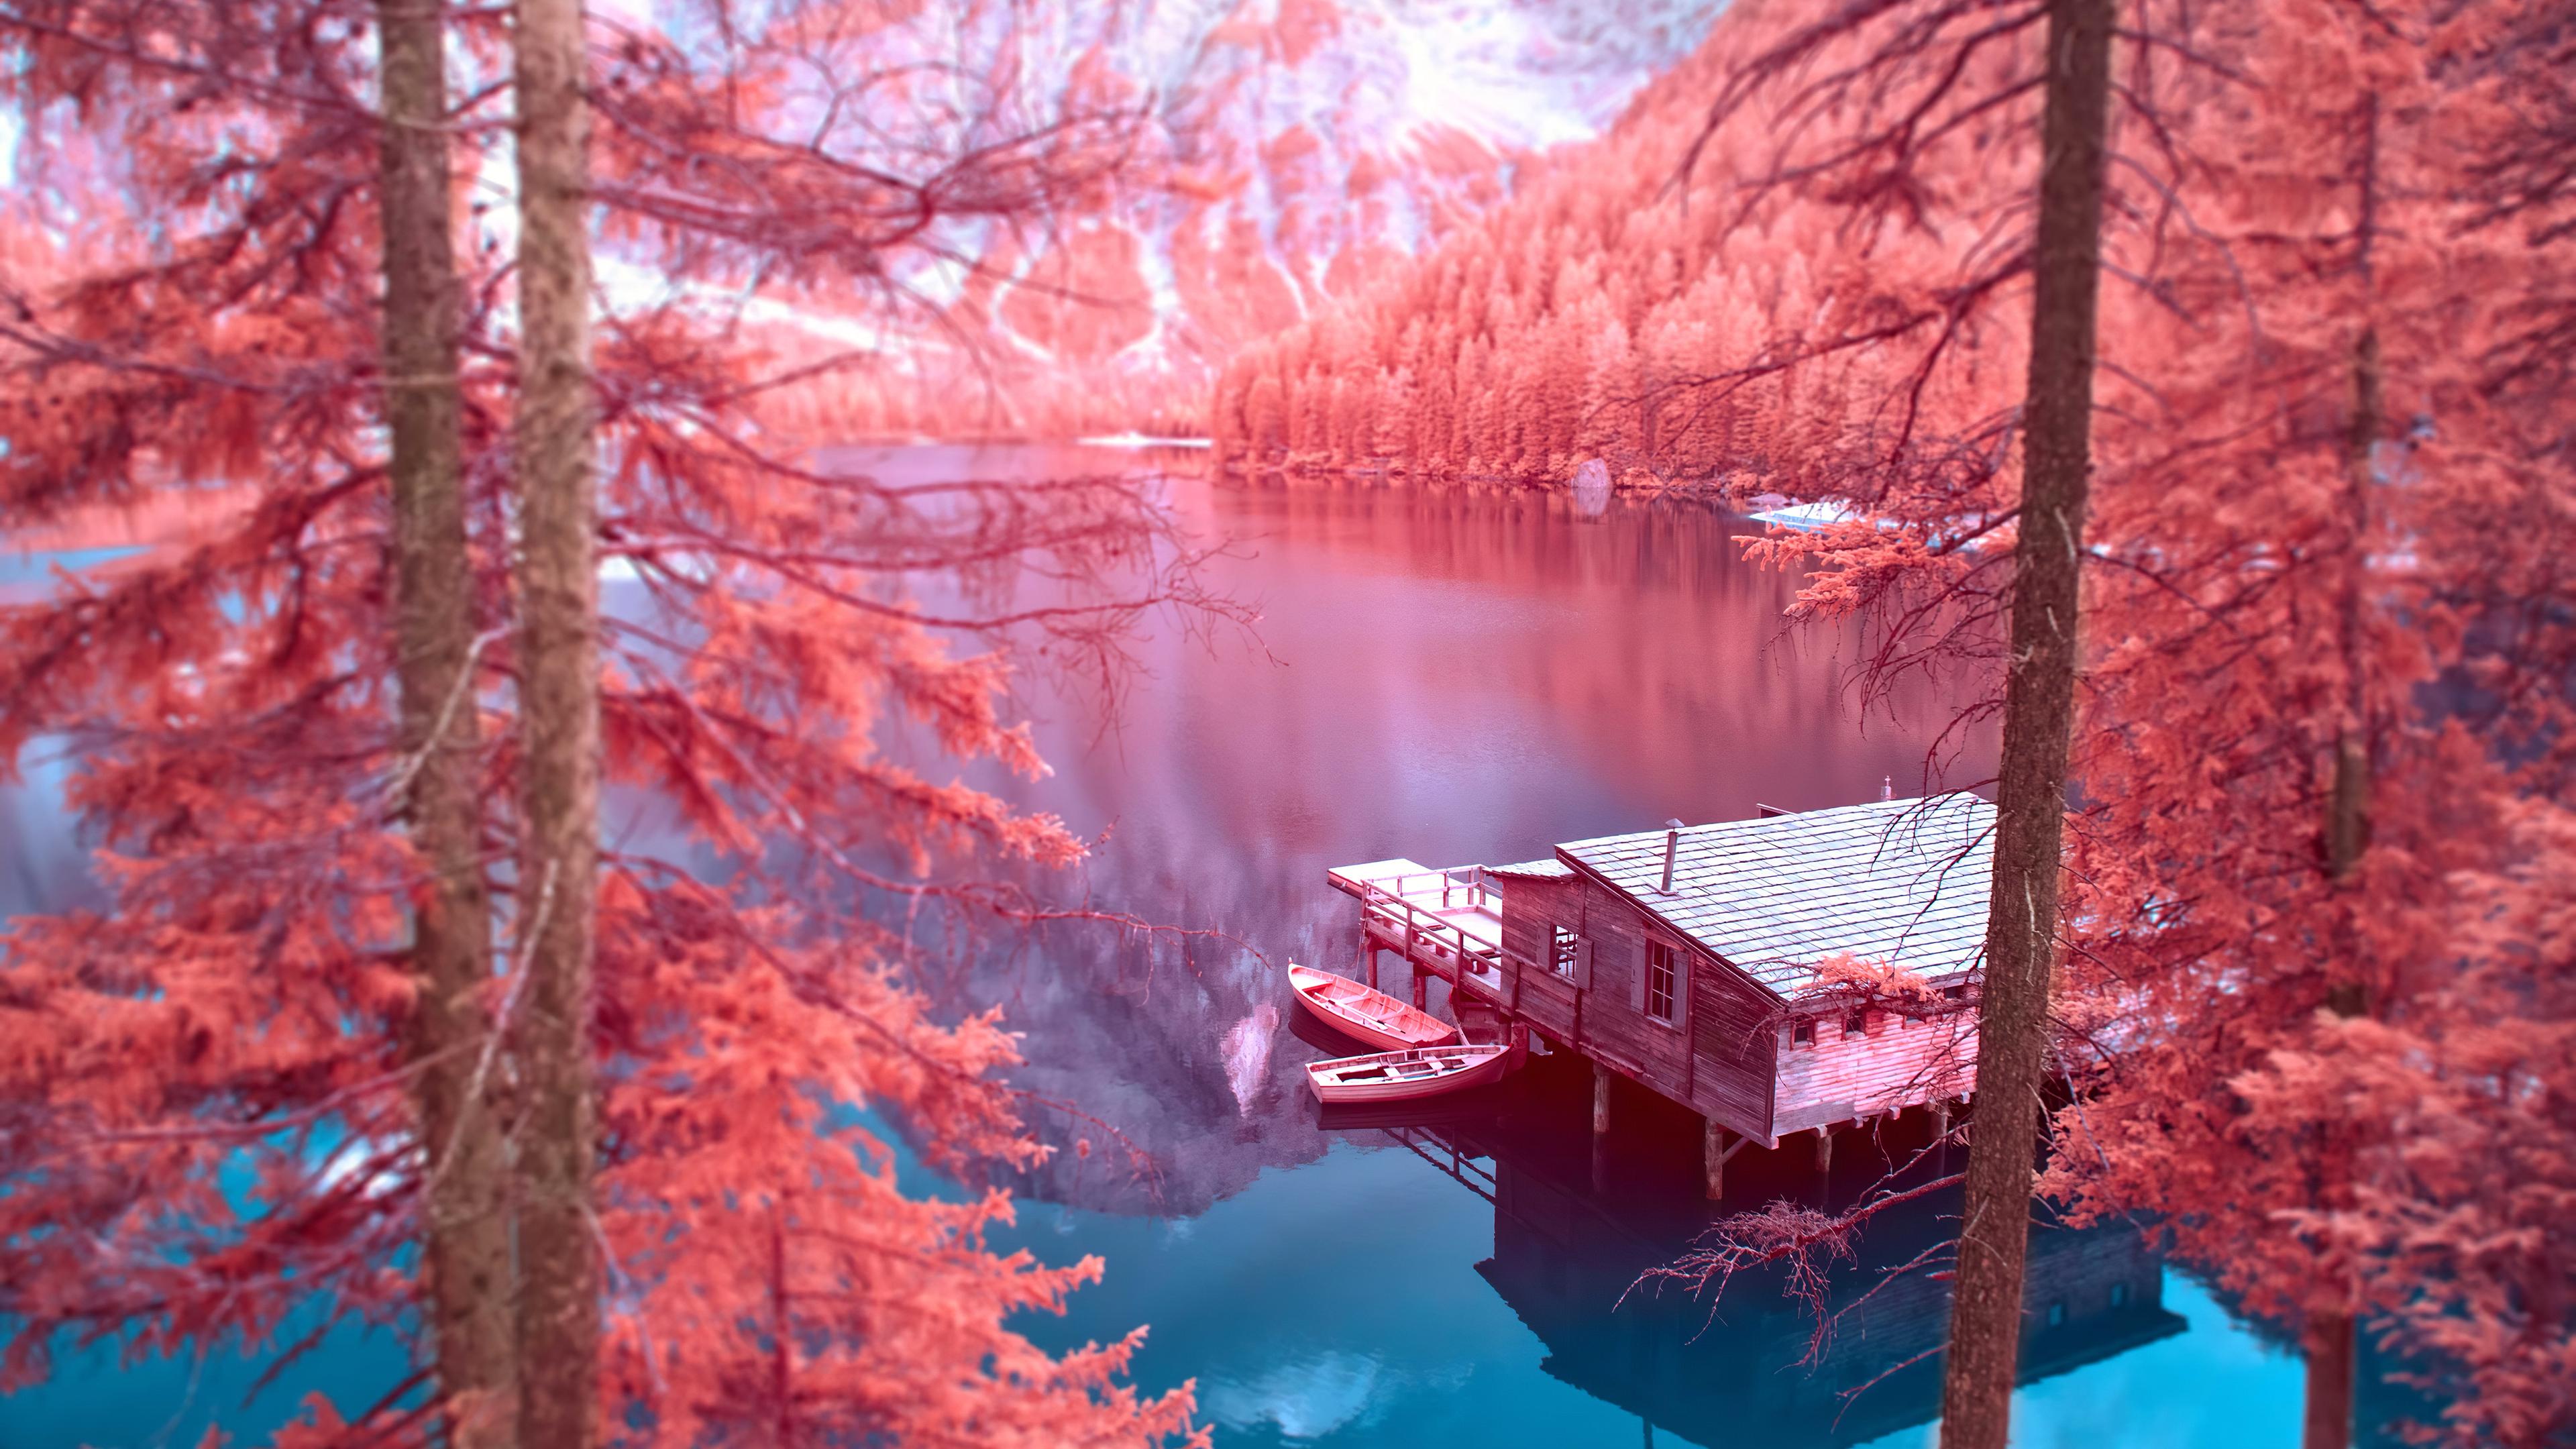 autumn nature 4k hd artist 4k